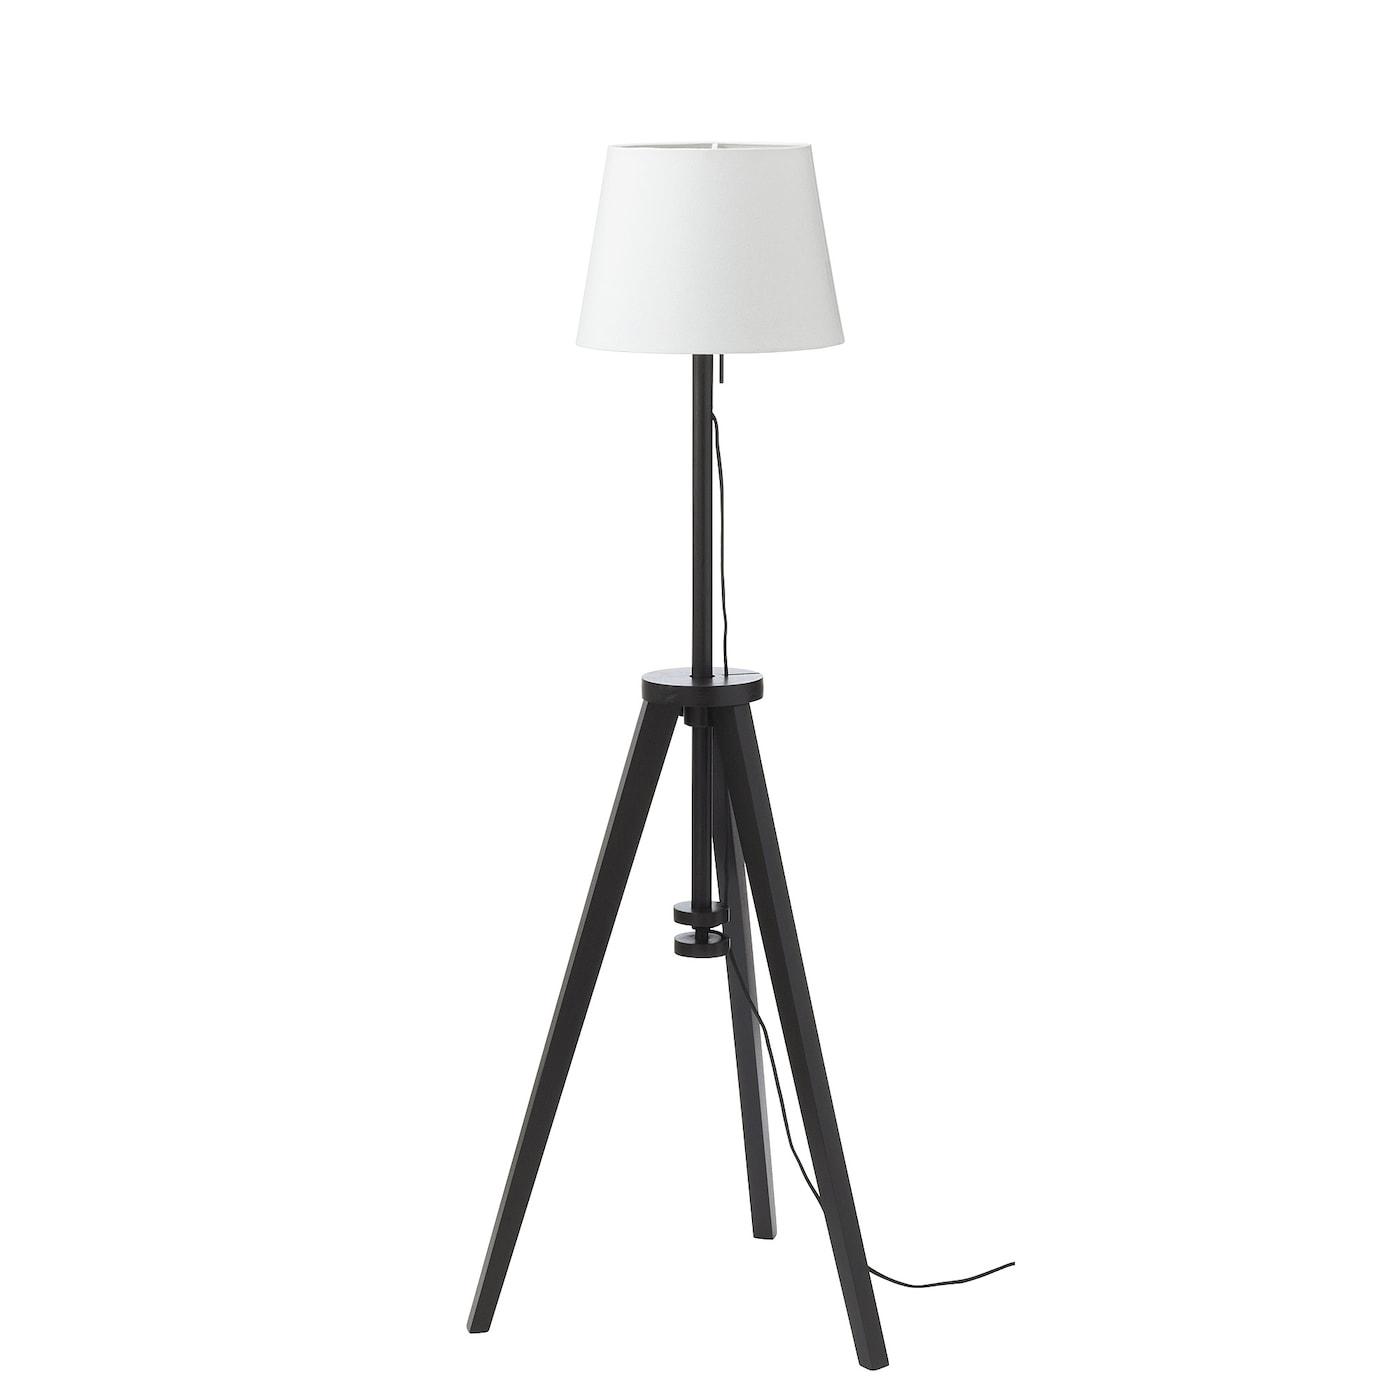 lampadaire liseuse ikea. Black Bedroom Furniture Sets. Home Design Ideas